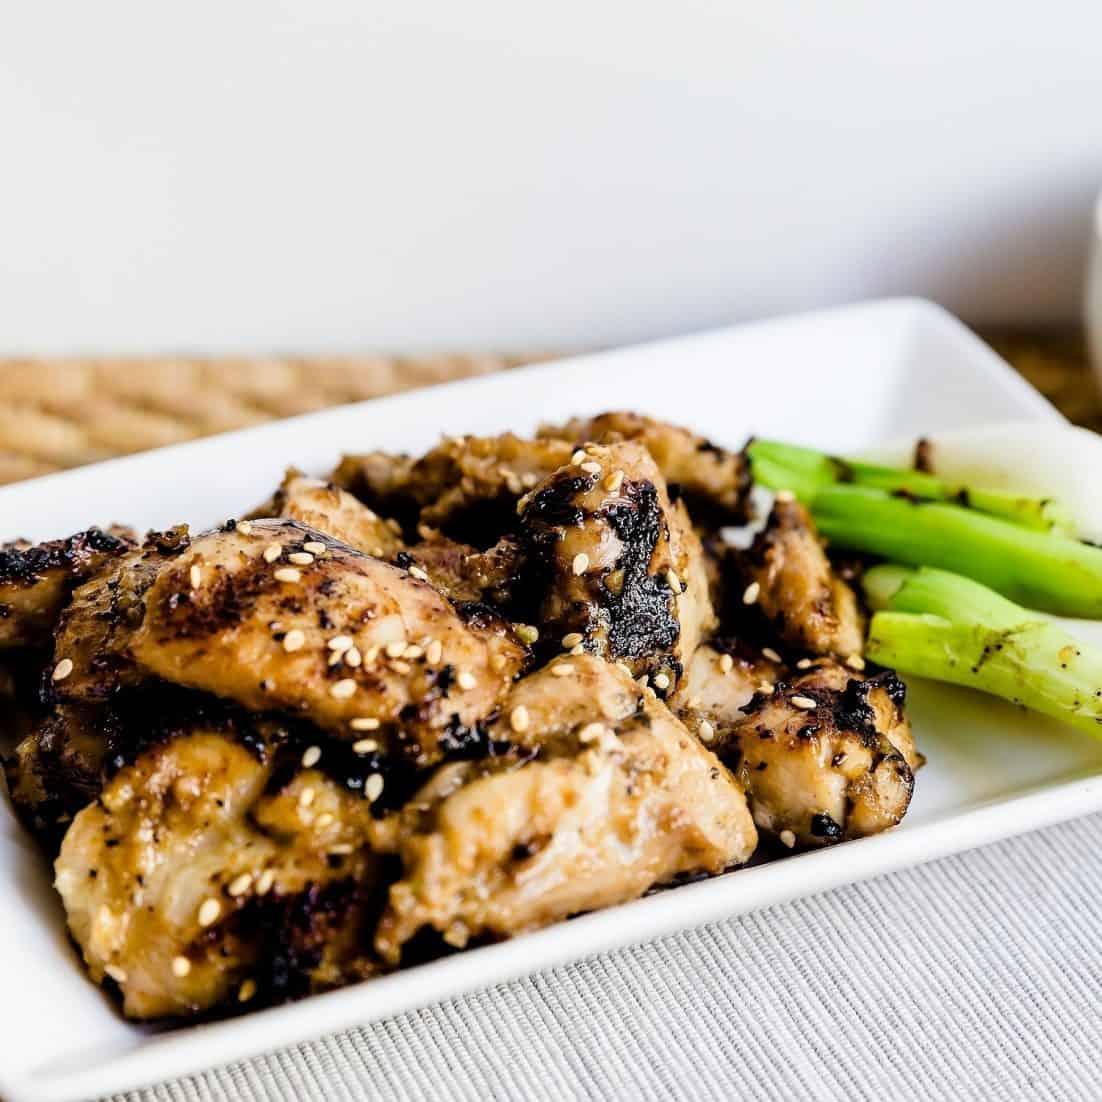 Keto Korean BBQ Marinated Chicken LowCarbingAsian Pic